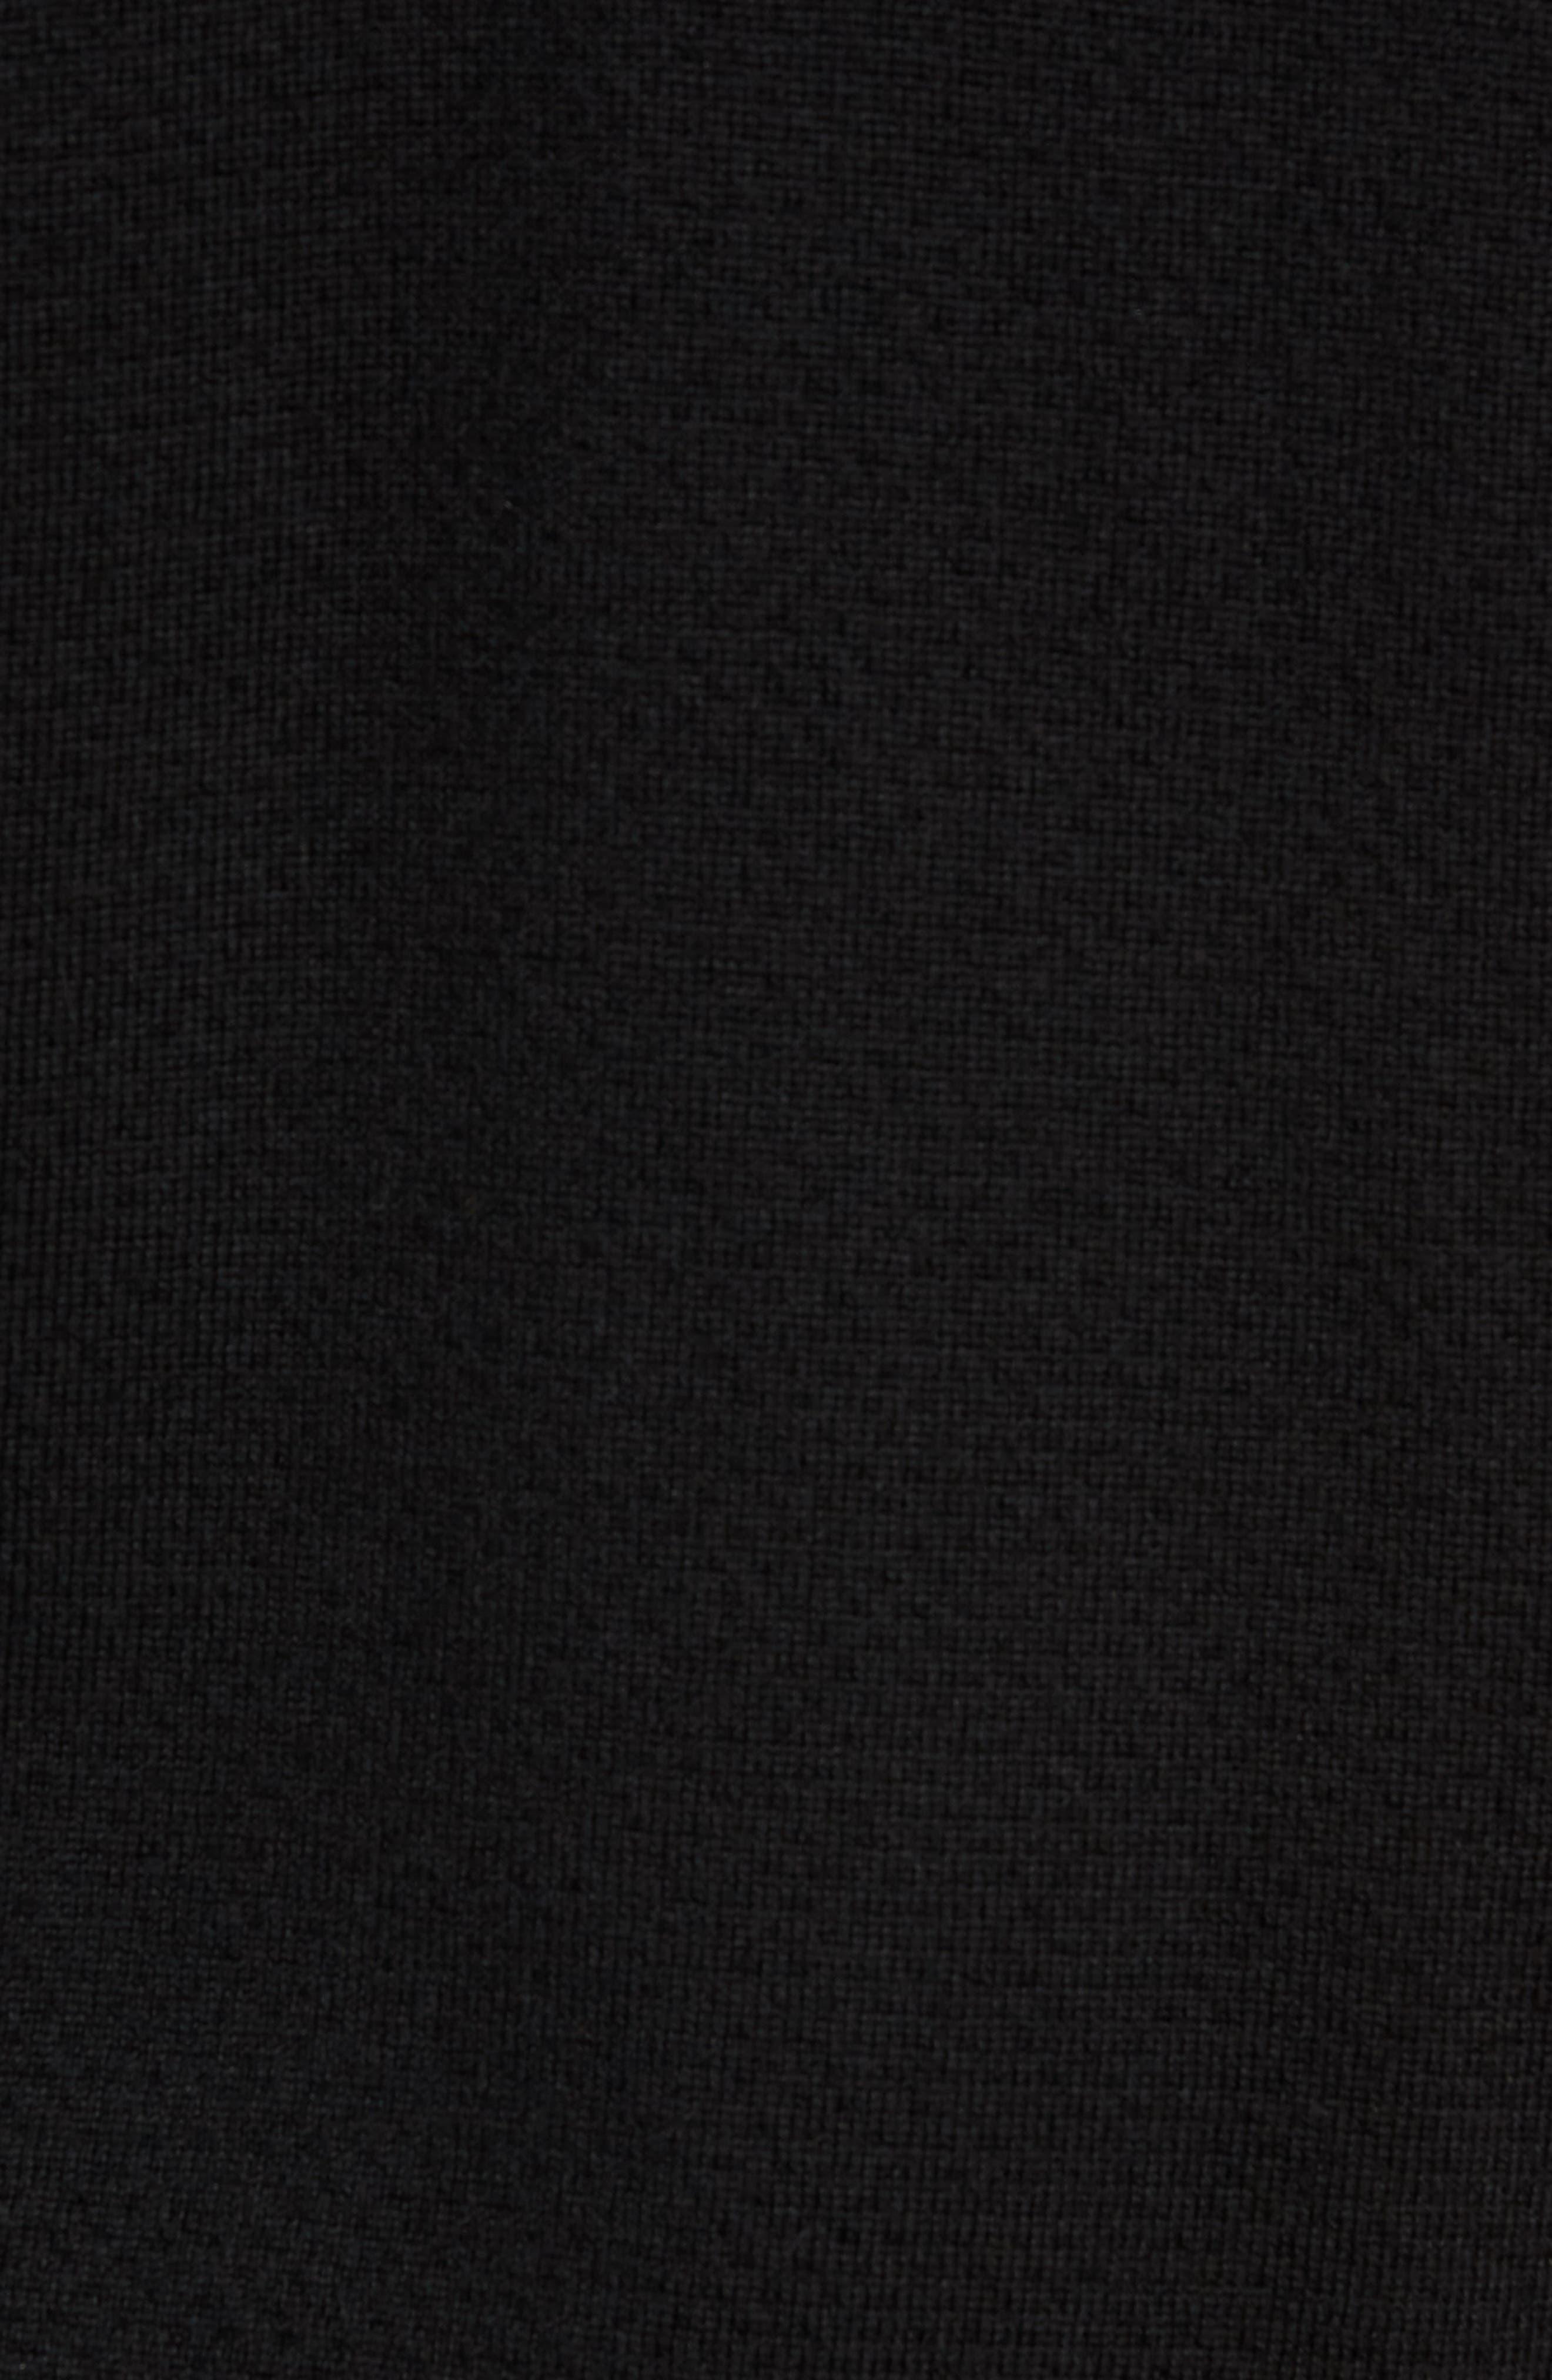 Orwell Slim Fit Wool Bomber Jacket,                             Alternate thumbnail 6, color,                             BLACK/ BLACK